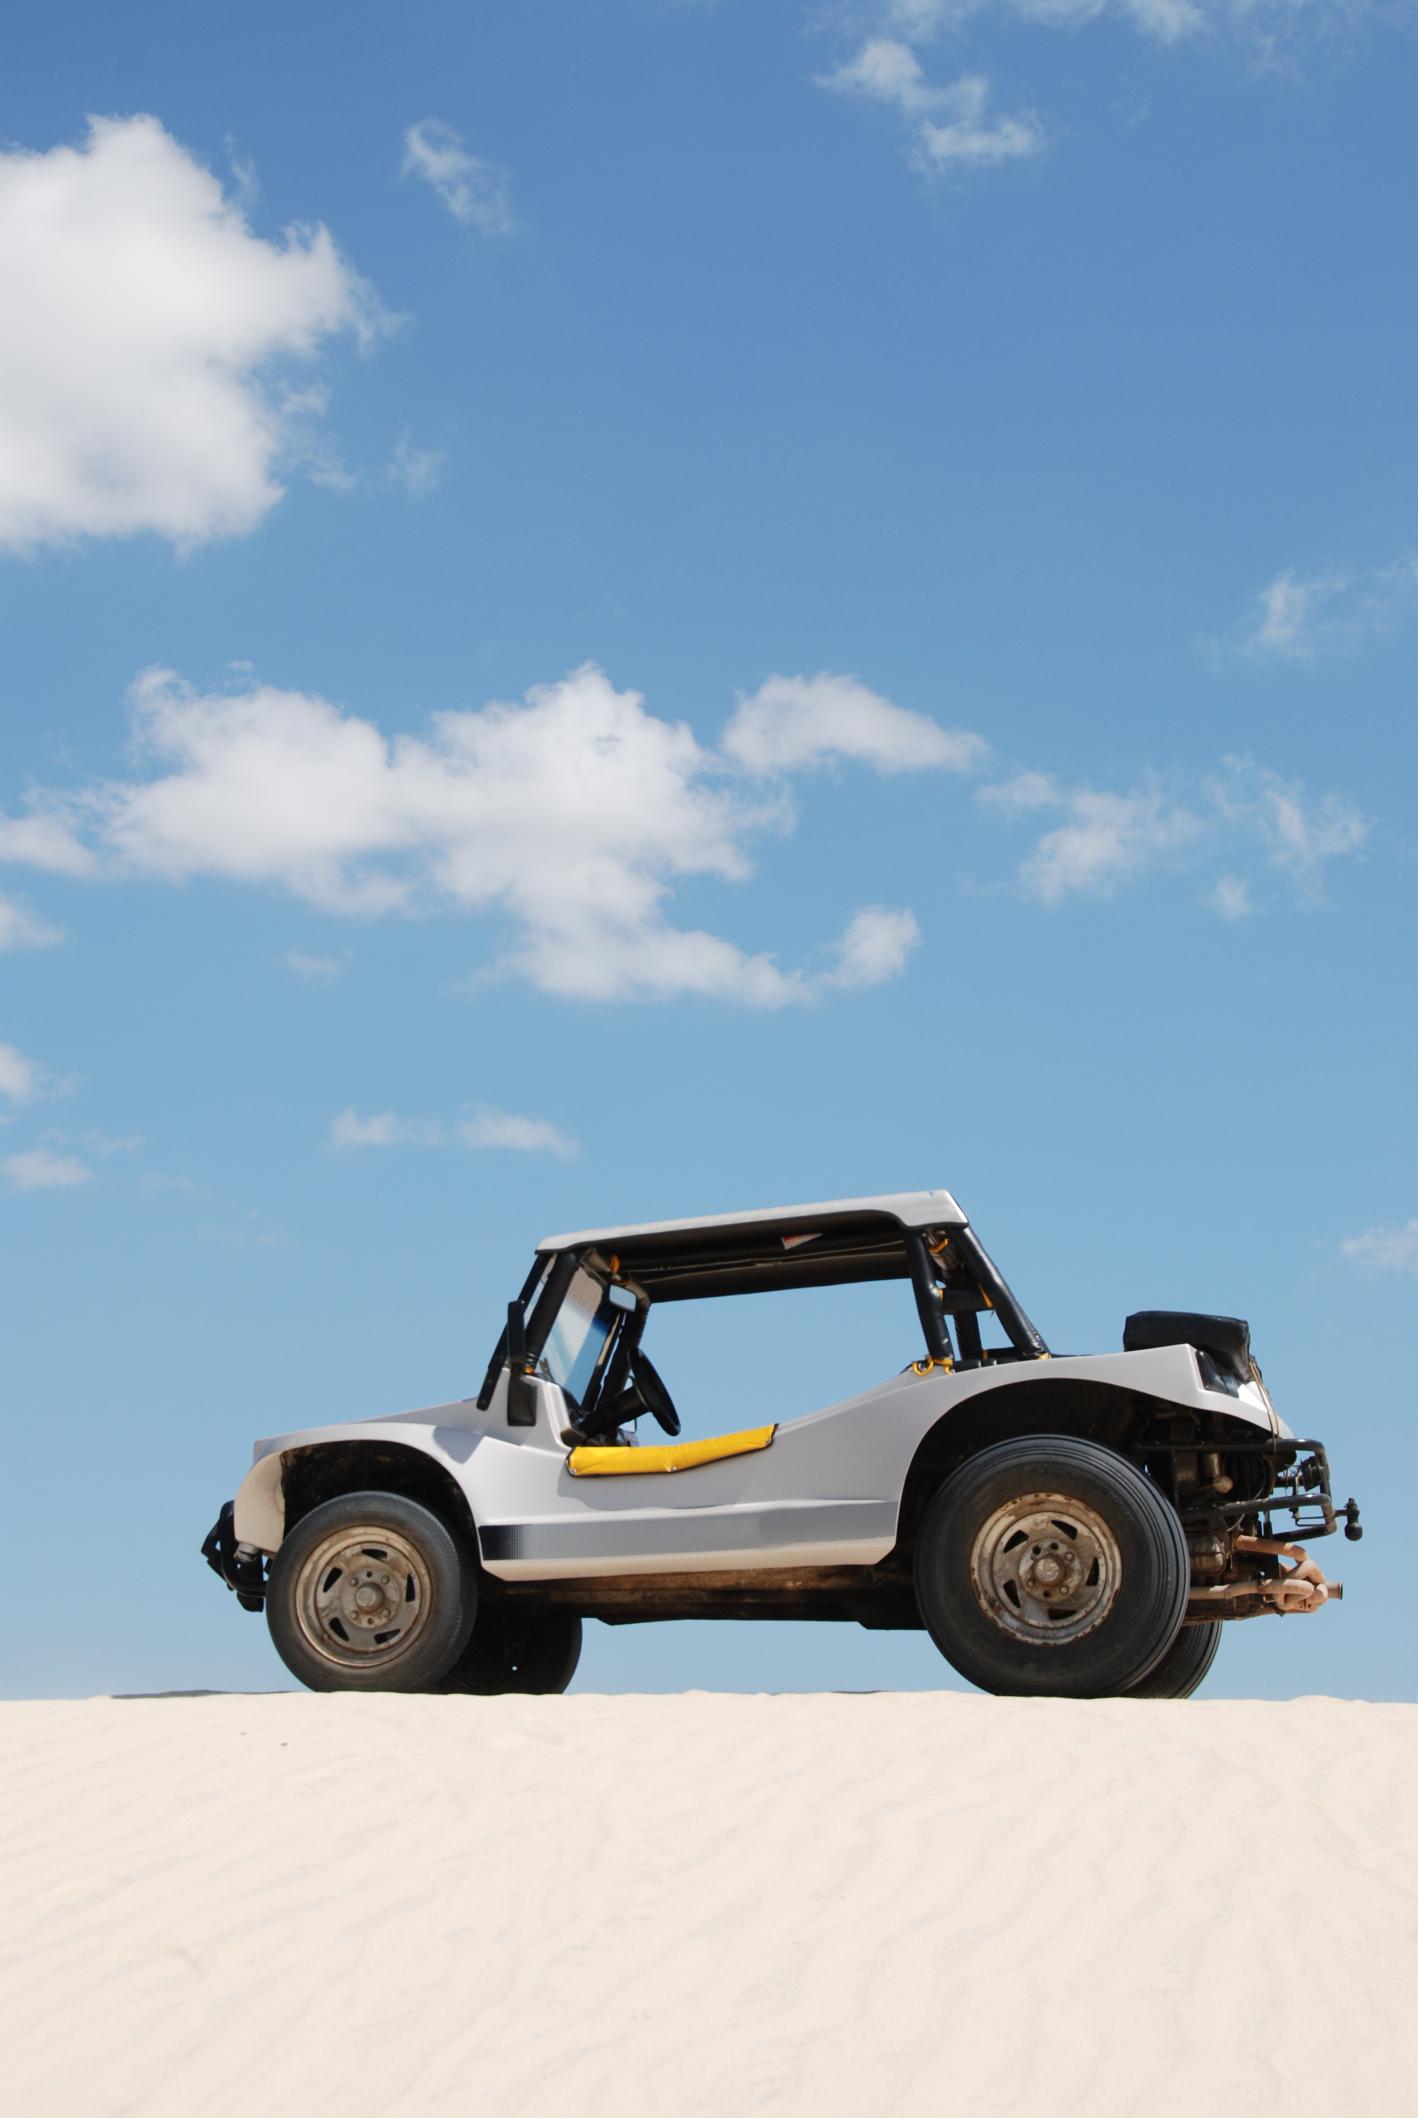 Different Types of Fiberglass Dune Buggy Bodies | It Still Runs